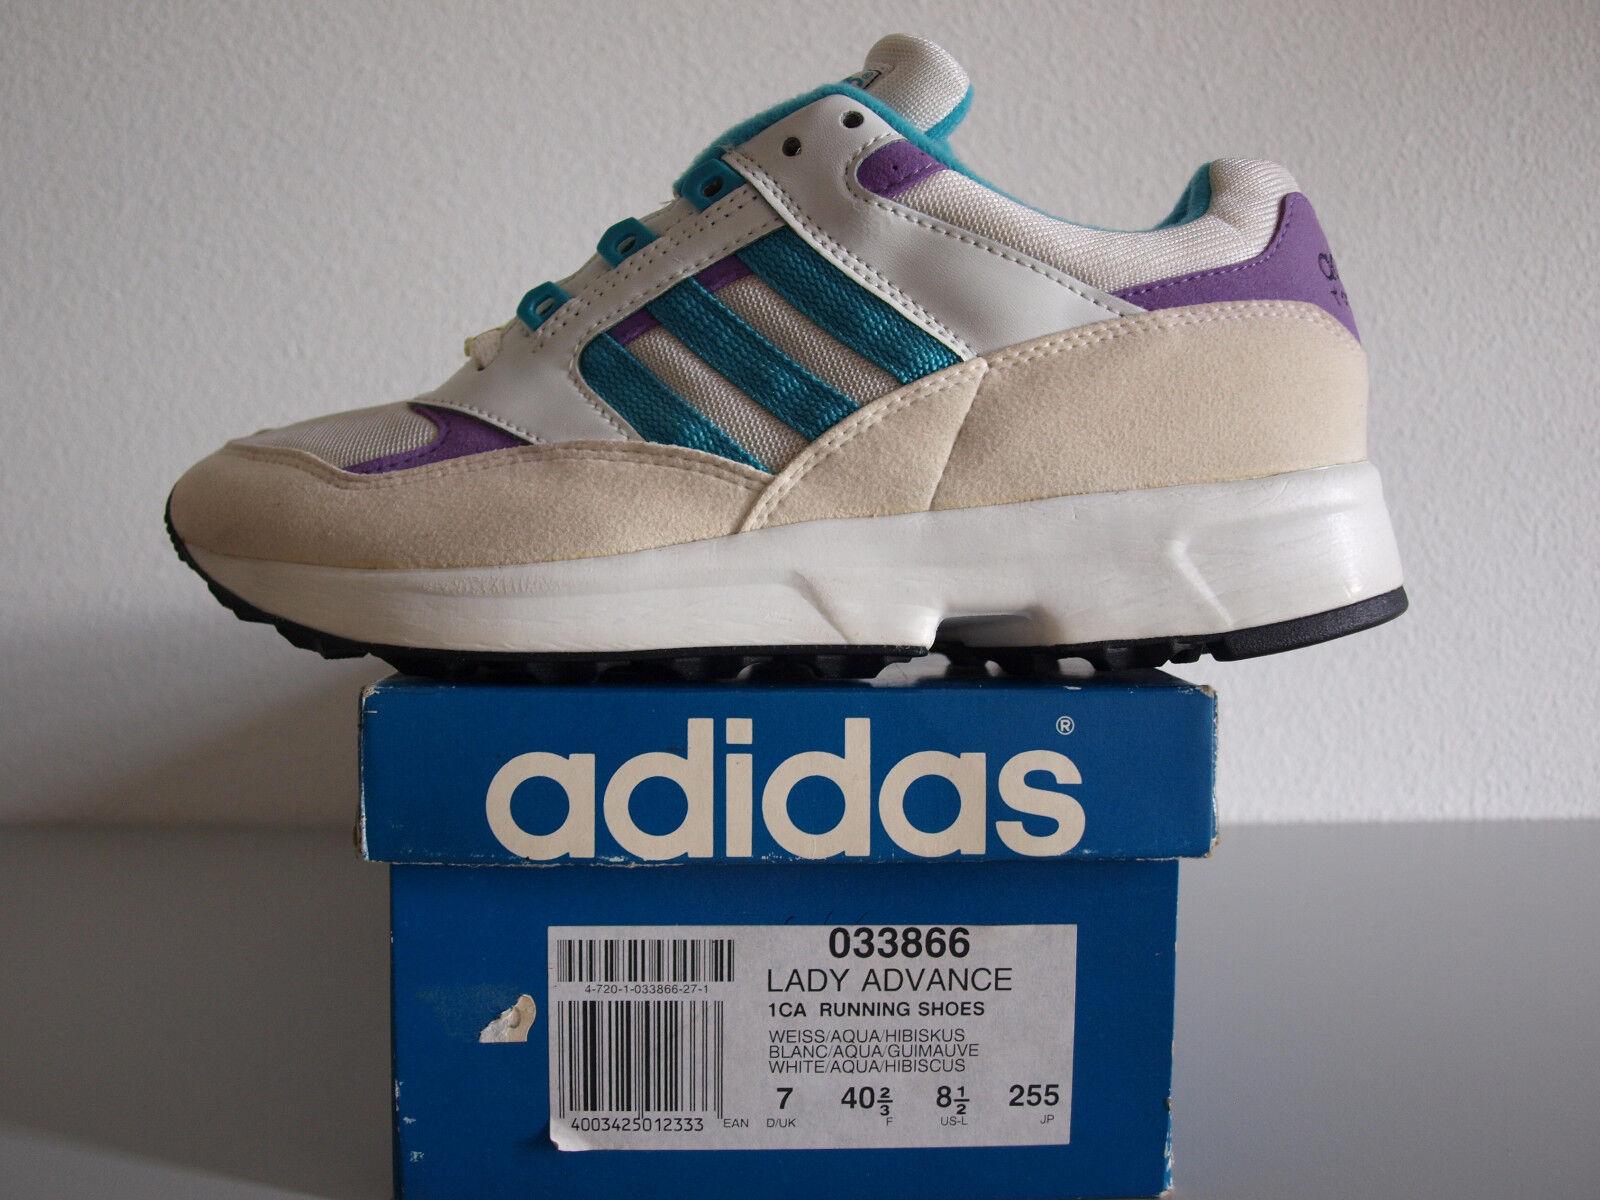 Adidas Torsión Dama Advance Raro Vintage US 7.5 /3 Raro Advance Nuevo Y En Caja 932f7f